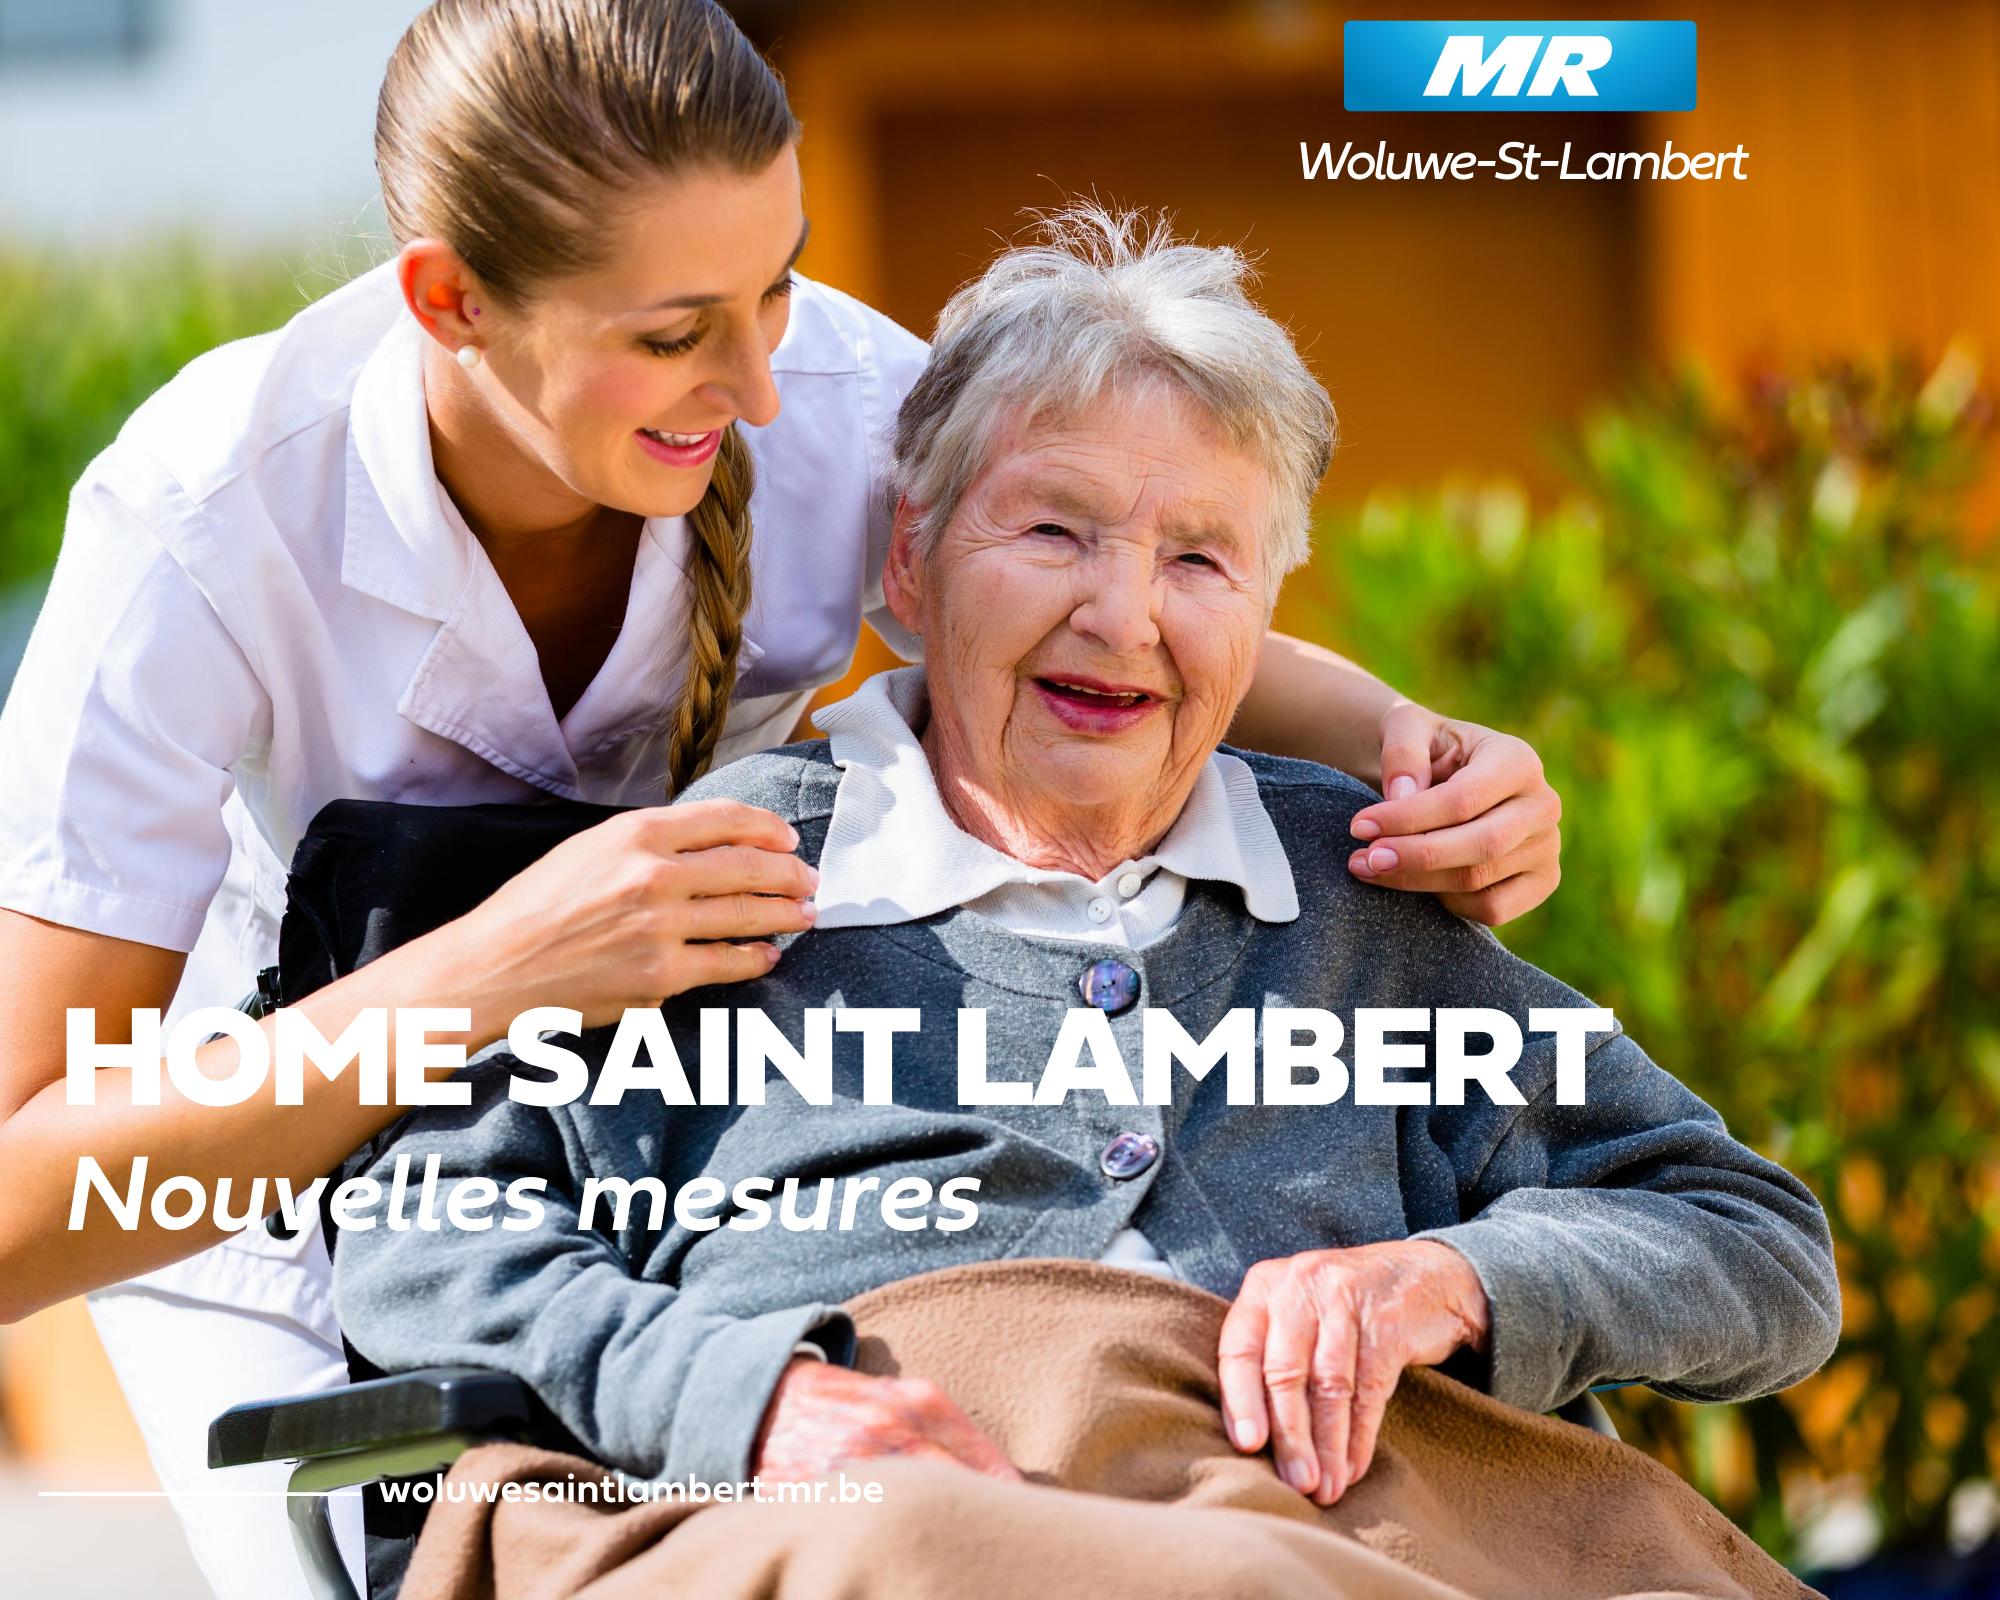 Nouvelles mesures au Home Saint-Lambert